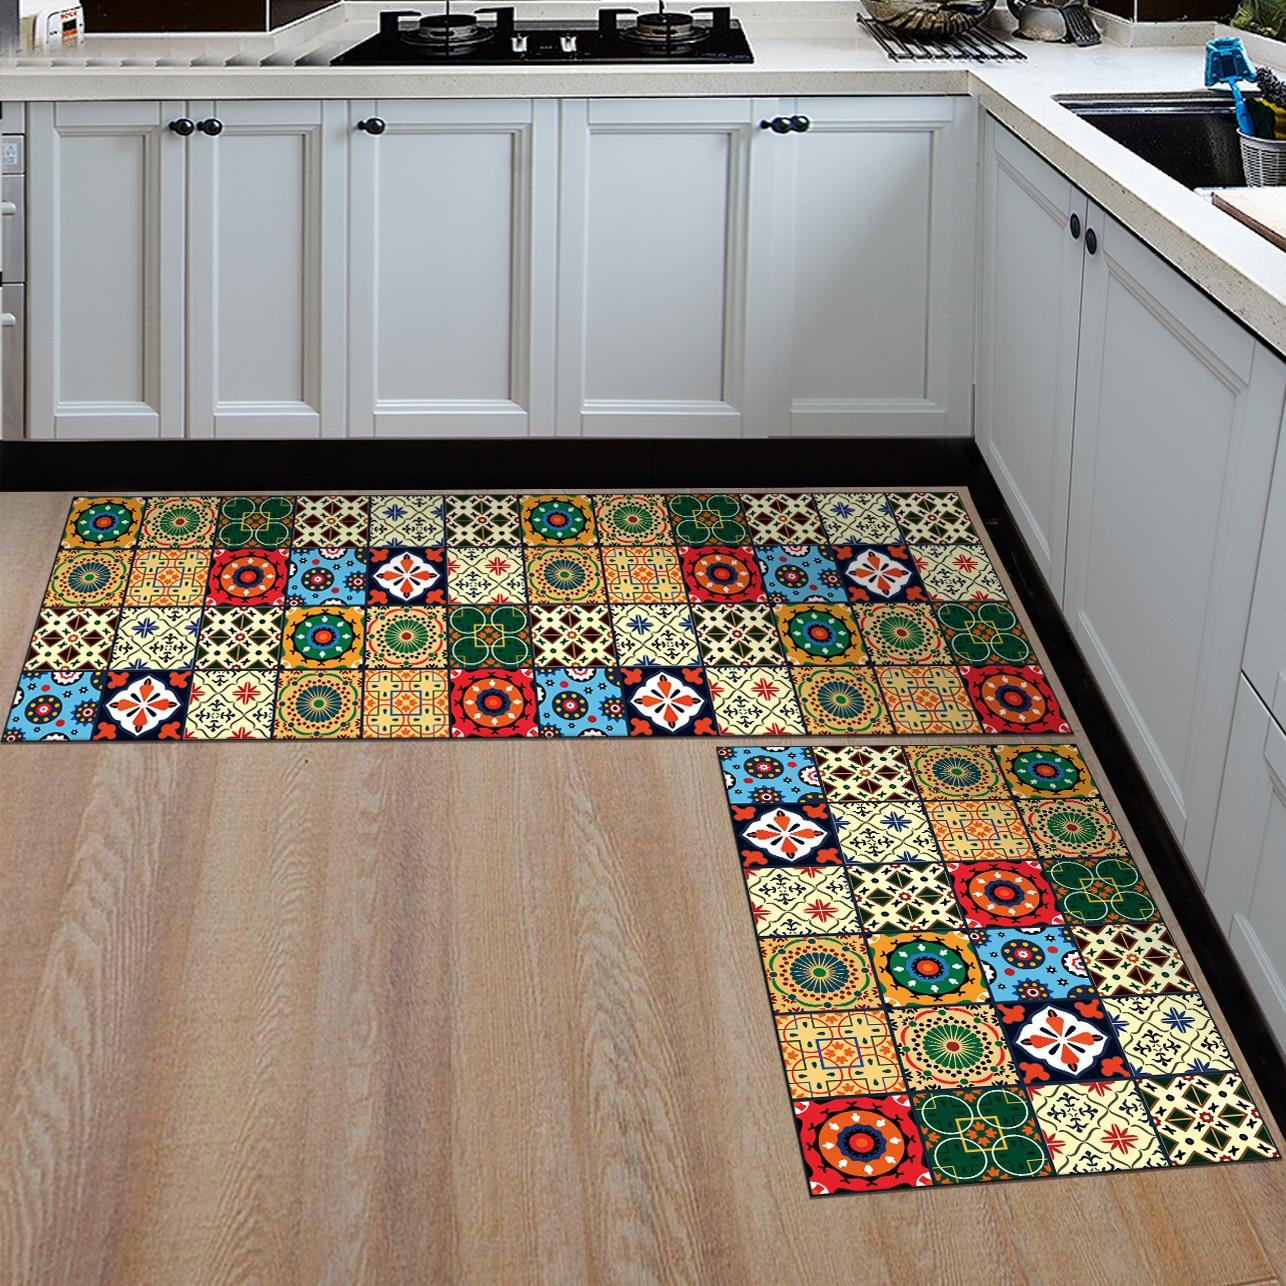 Anti slip Kitchen Floor Mat Printed Kitchen Rugs Modern Area Rug for  Kitchen Bathroom Carpet Doormat Hallway Geometric Bath Mat